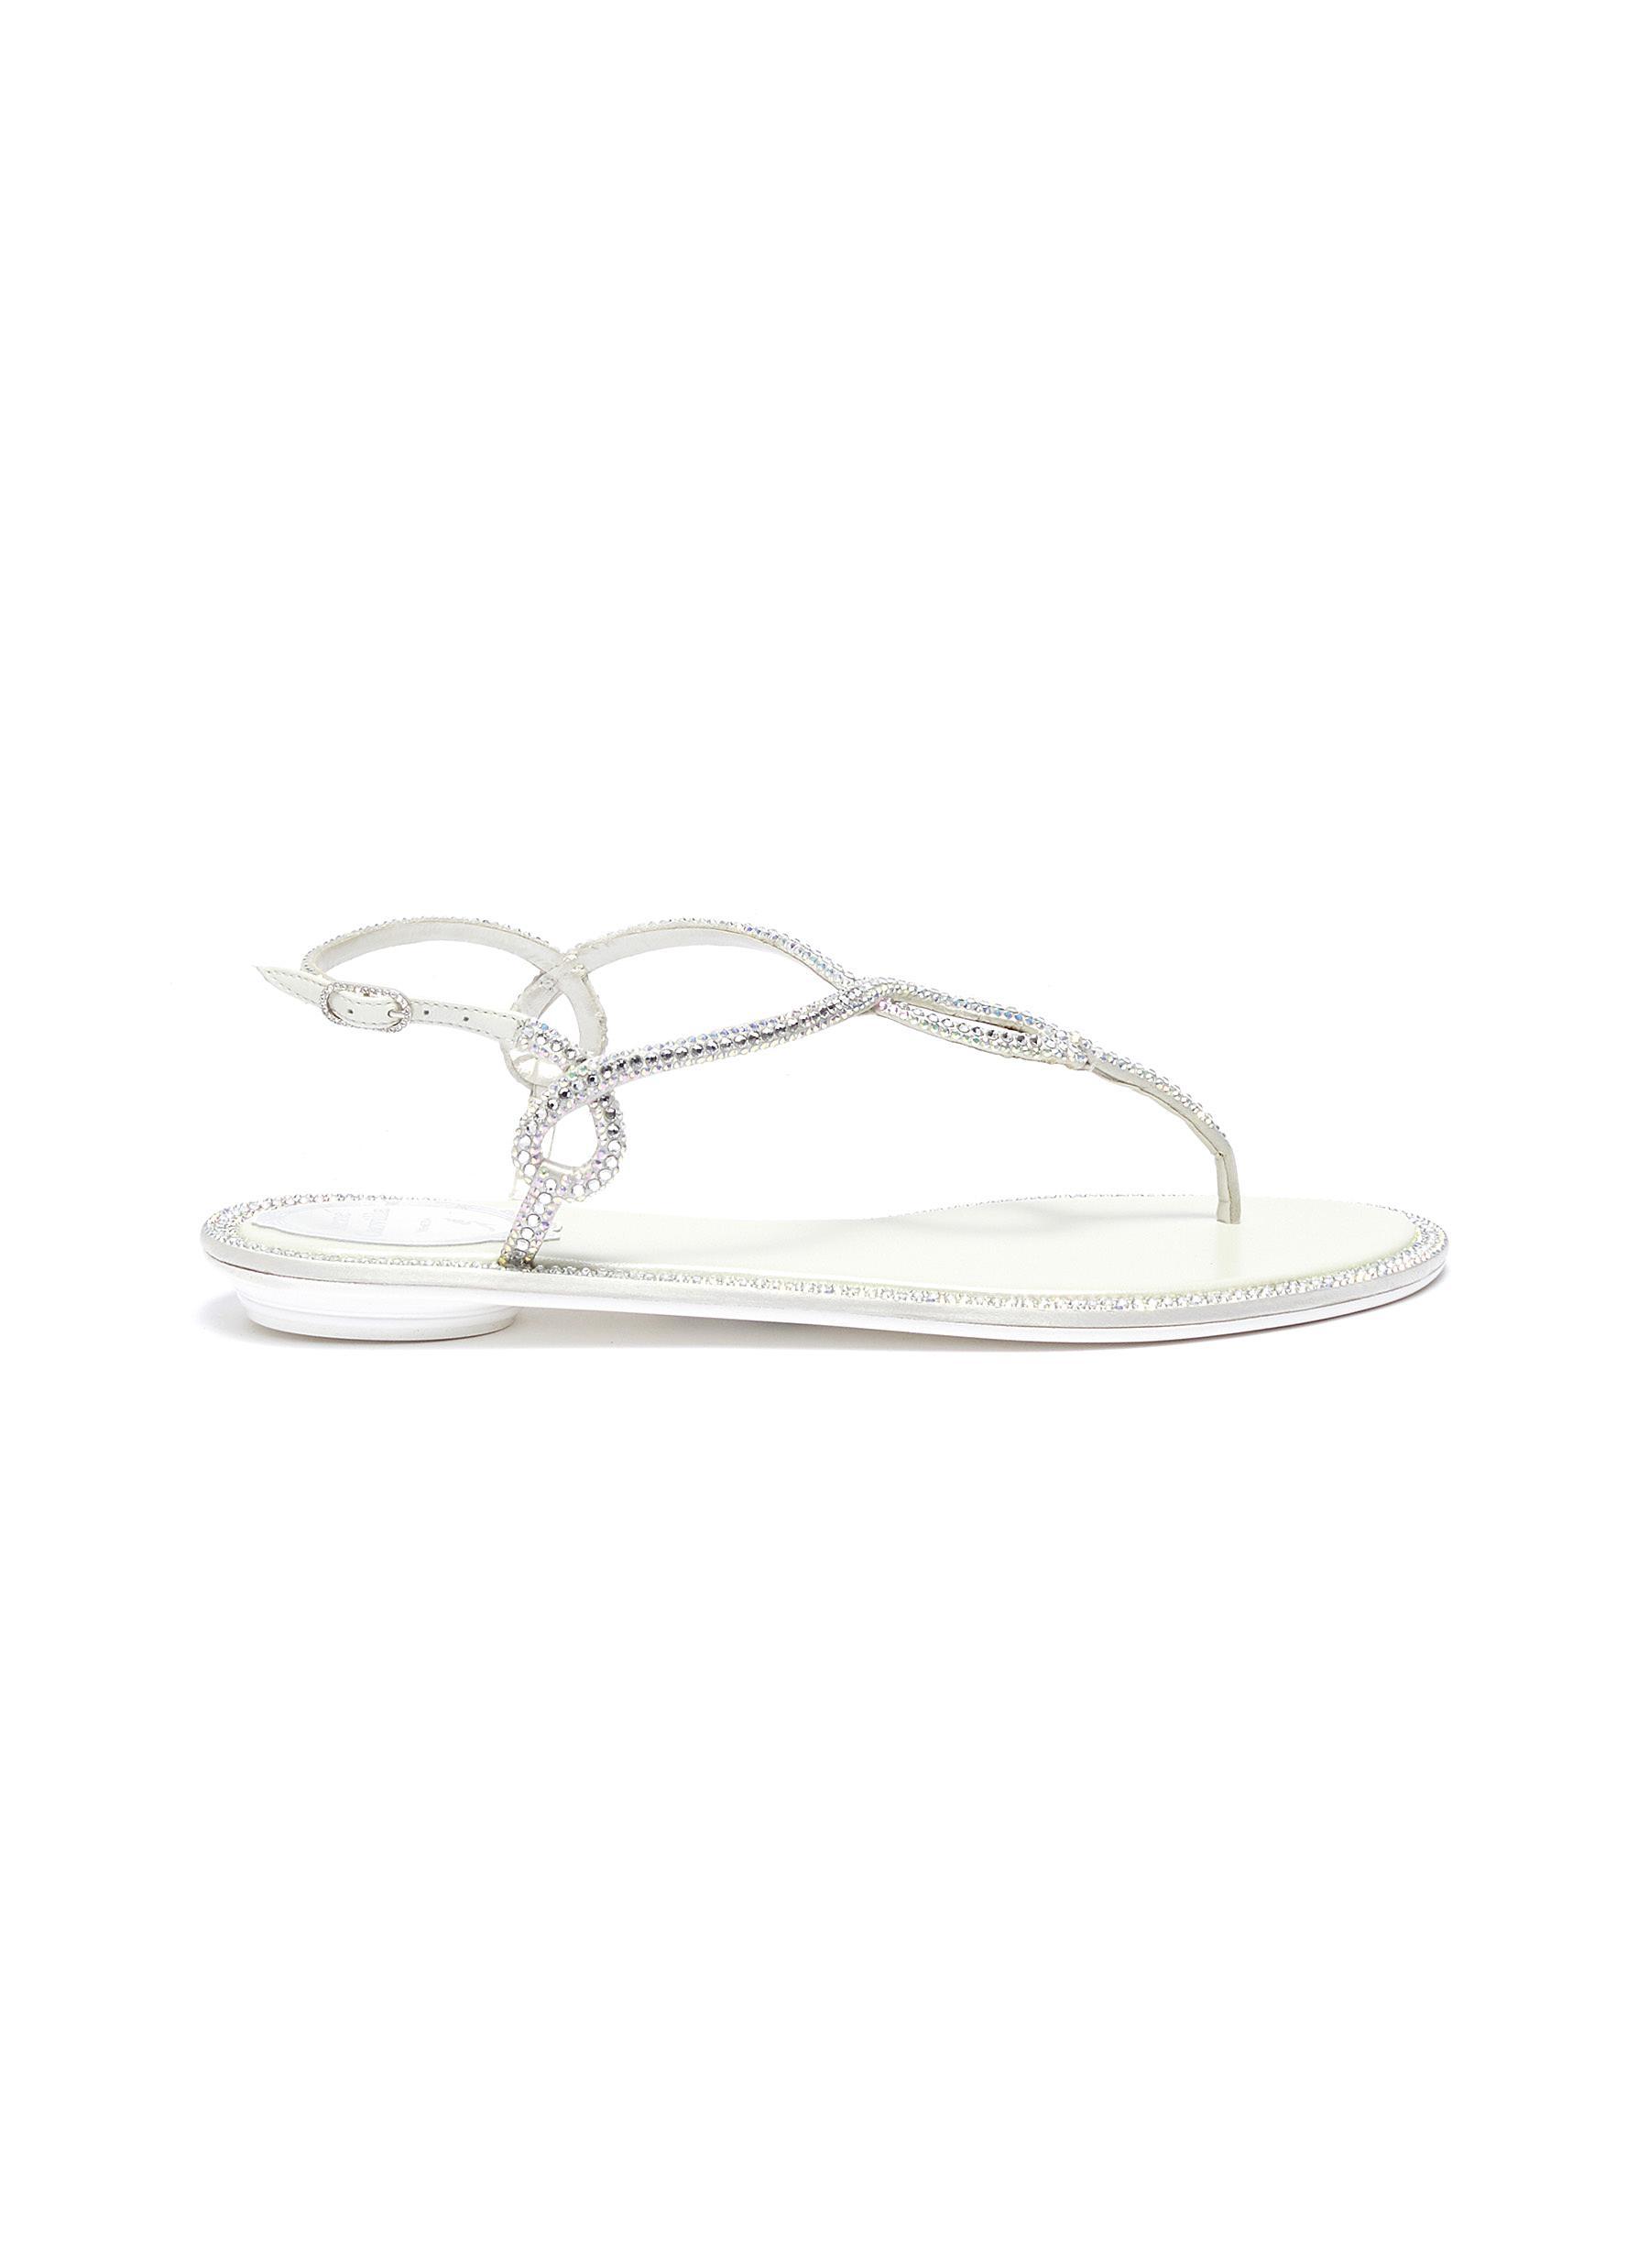 Strass satin thong sandals by René Caovilla